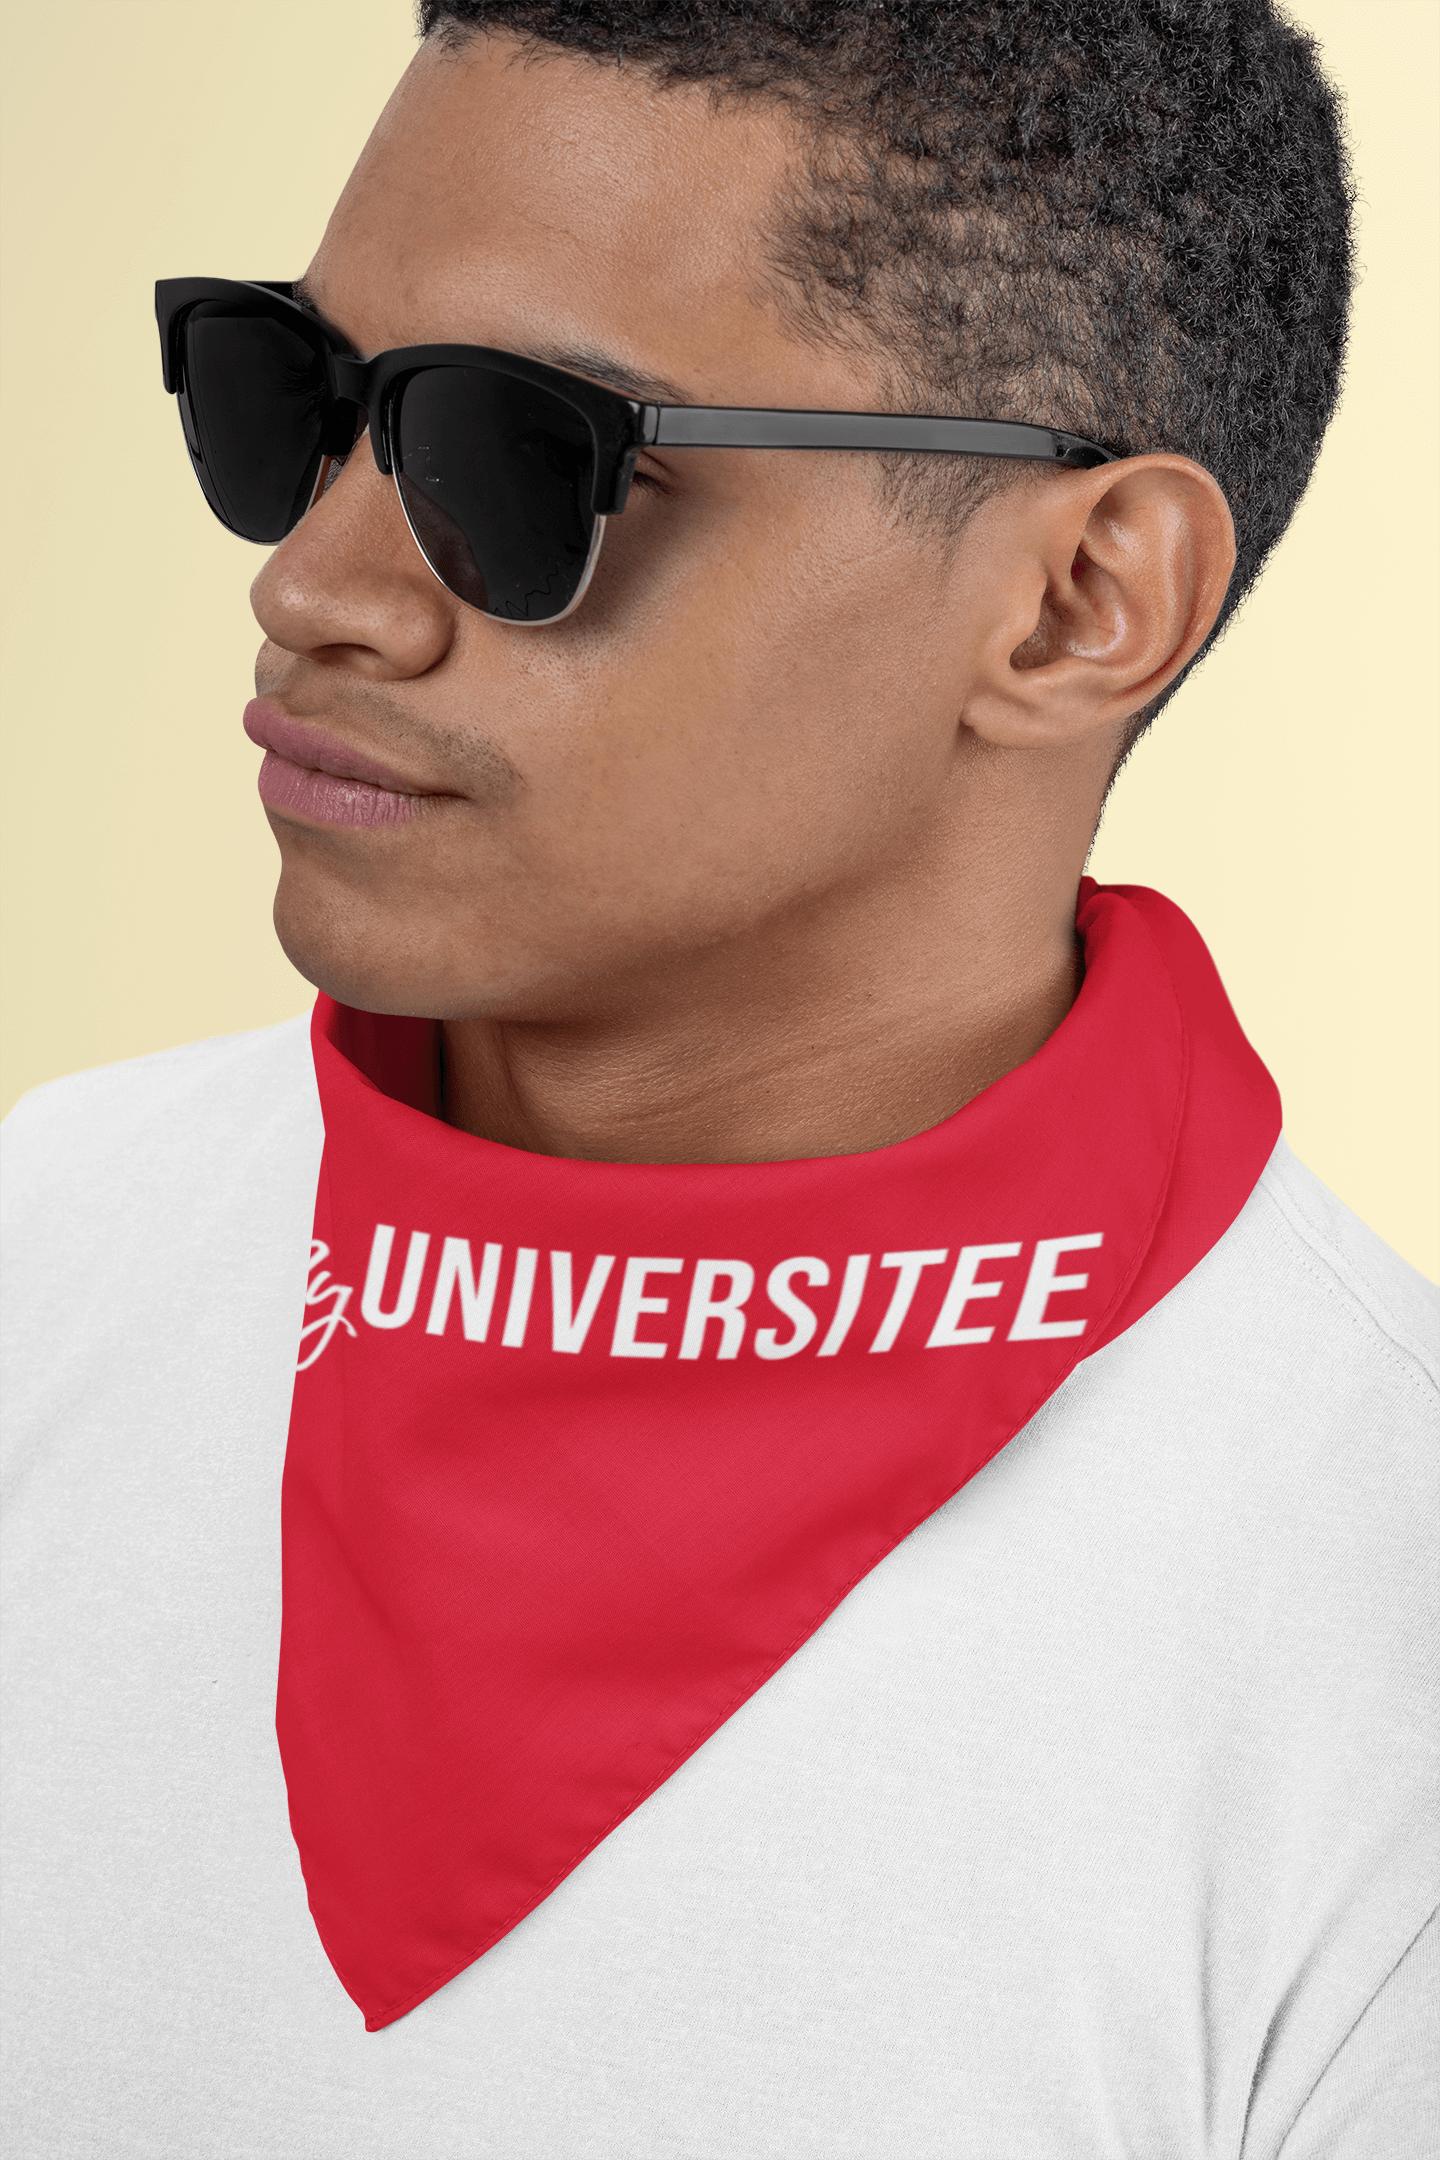 bandana-mockup-of-a-man-with-sunglasses-29594